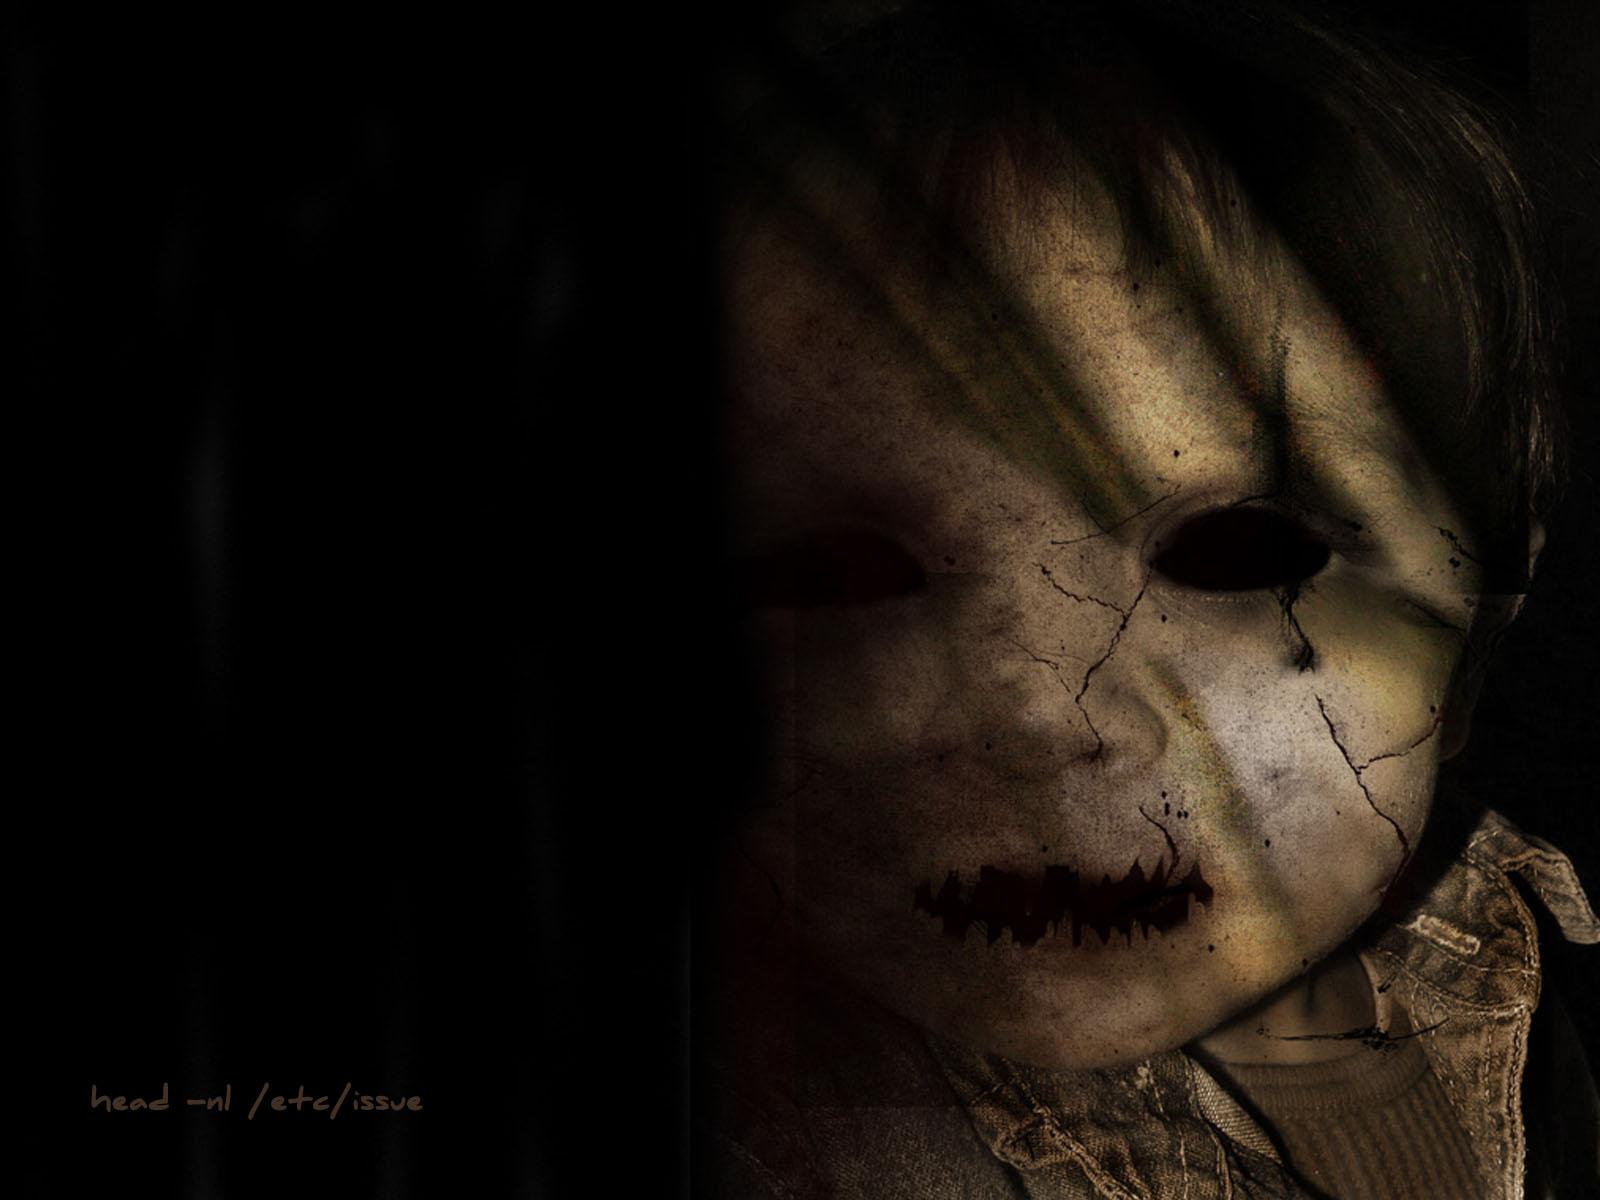 Horror wallpaper mobiletricks for Creepy gothic pictures